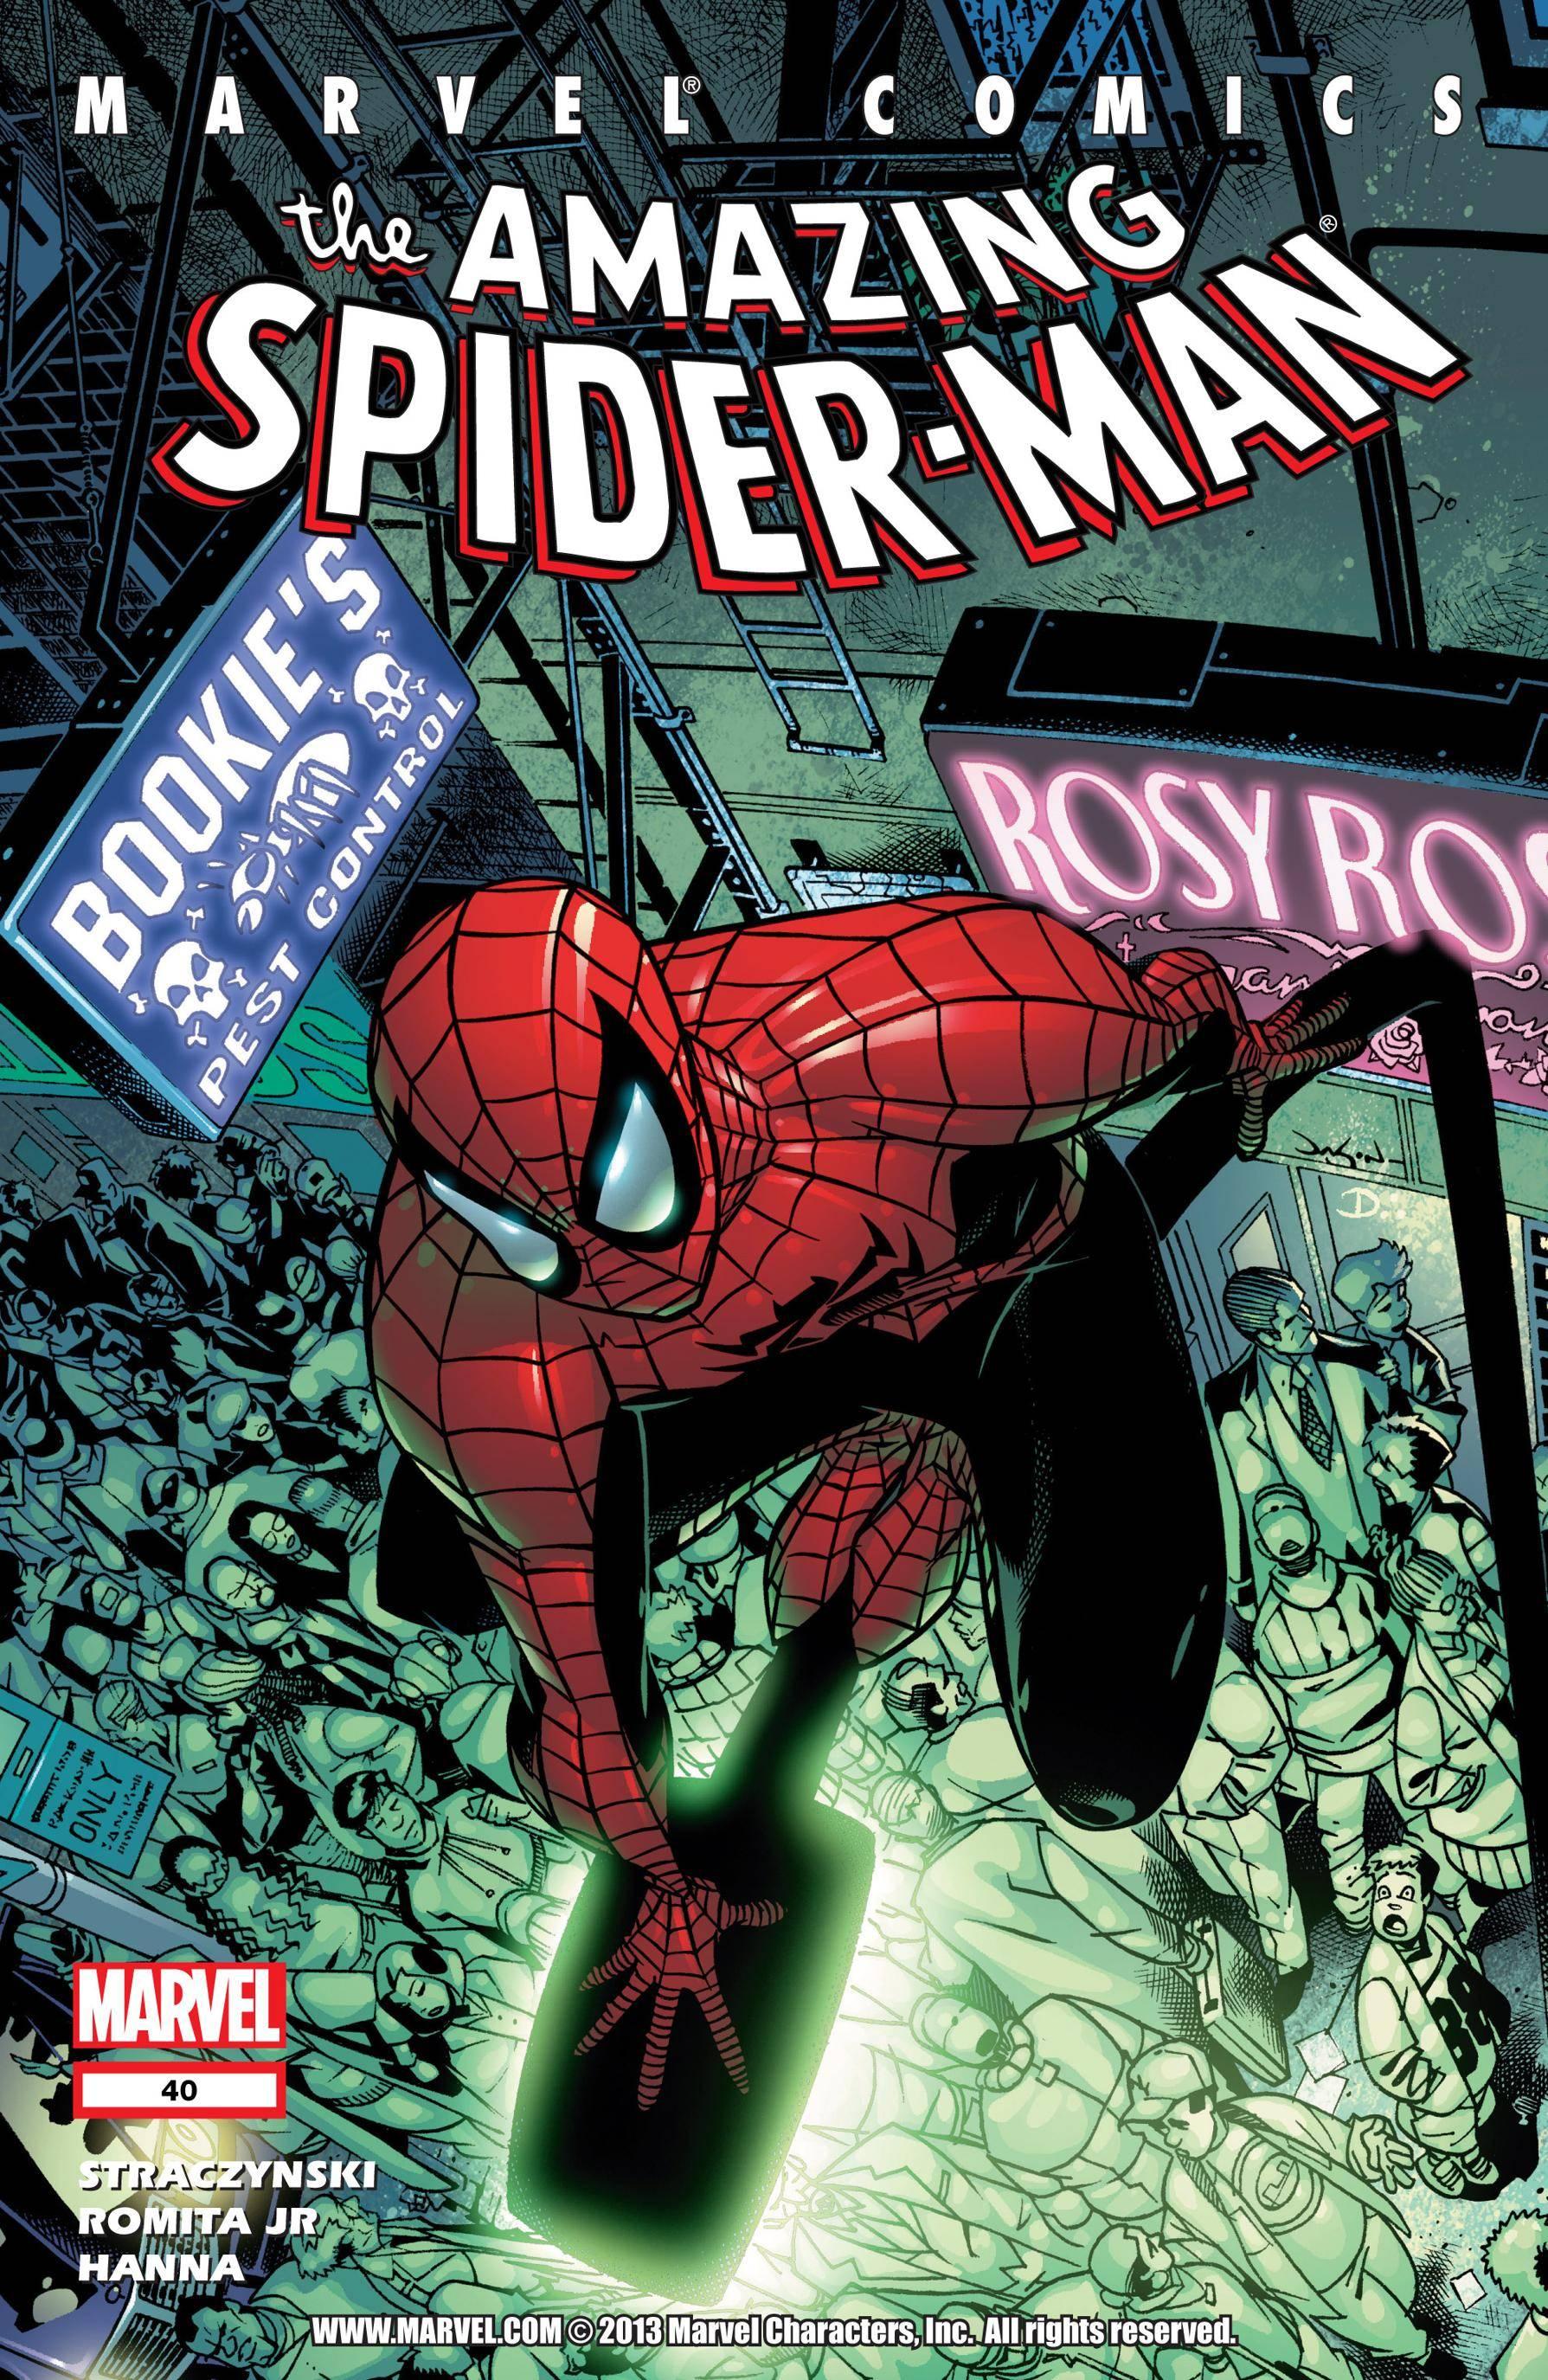 New Releases 2015 3 24 The Amazing Spider-Man 040 481 2002 digital-hd-Empire cbr